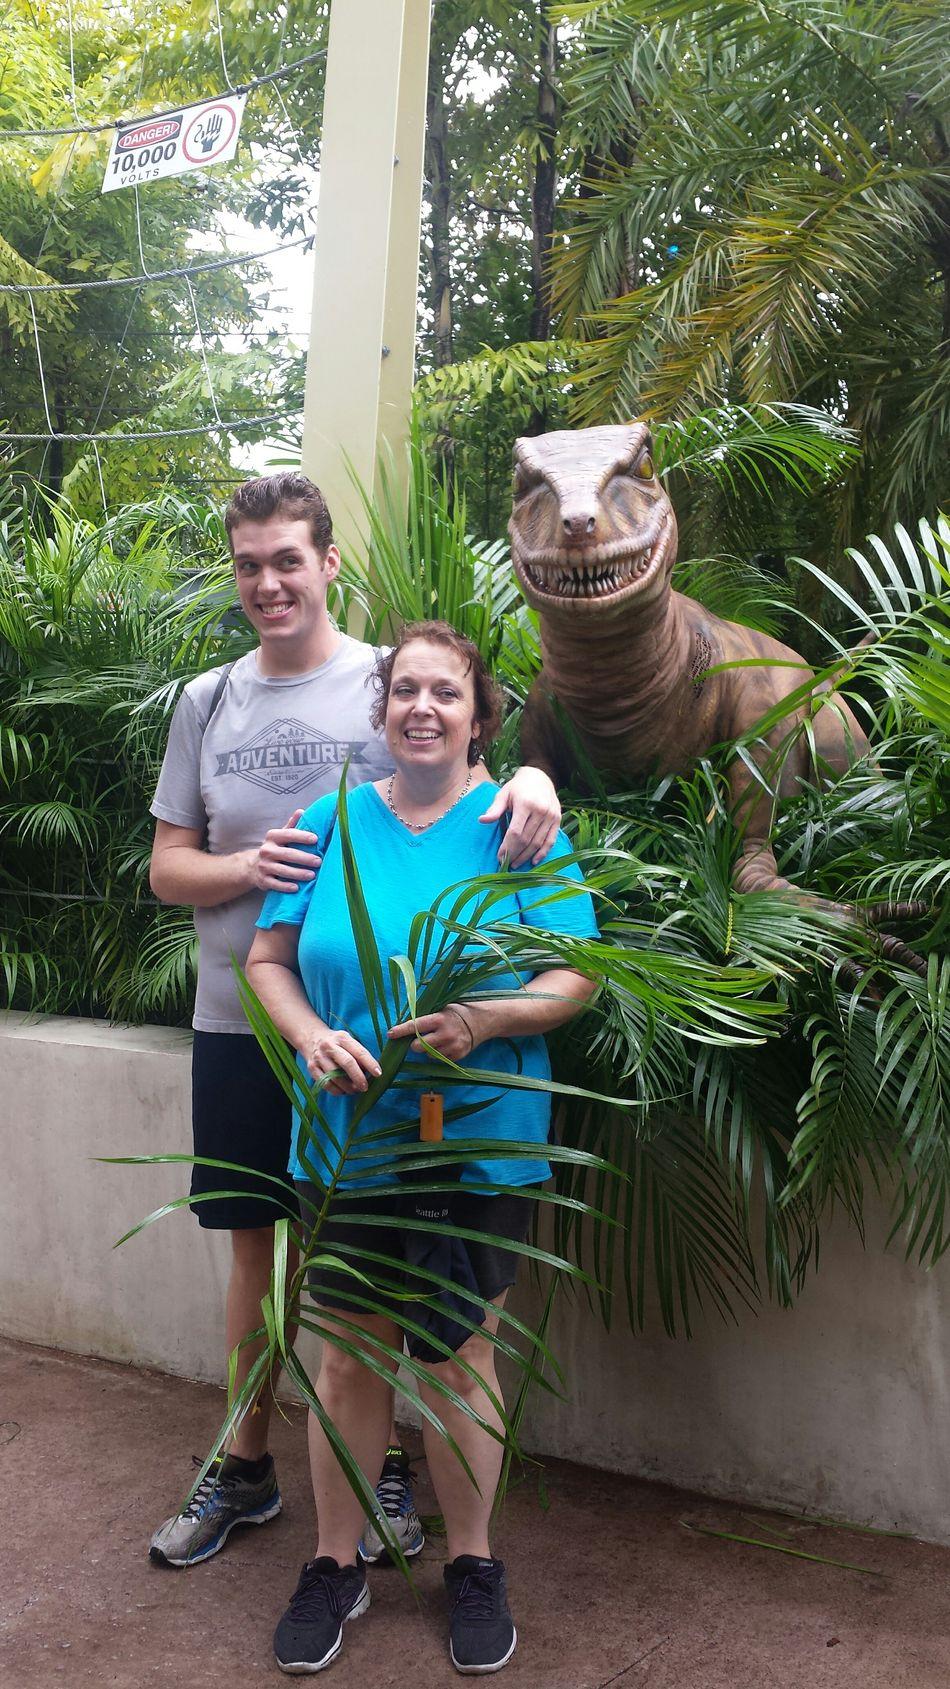 A family with a smile (: Smiling Smile Happy Eyeem Smile EyeEm Smiling Dinosaur Life Experiences Enjoyment